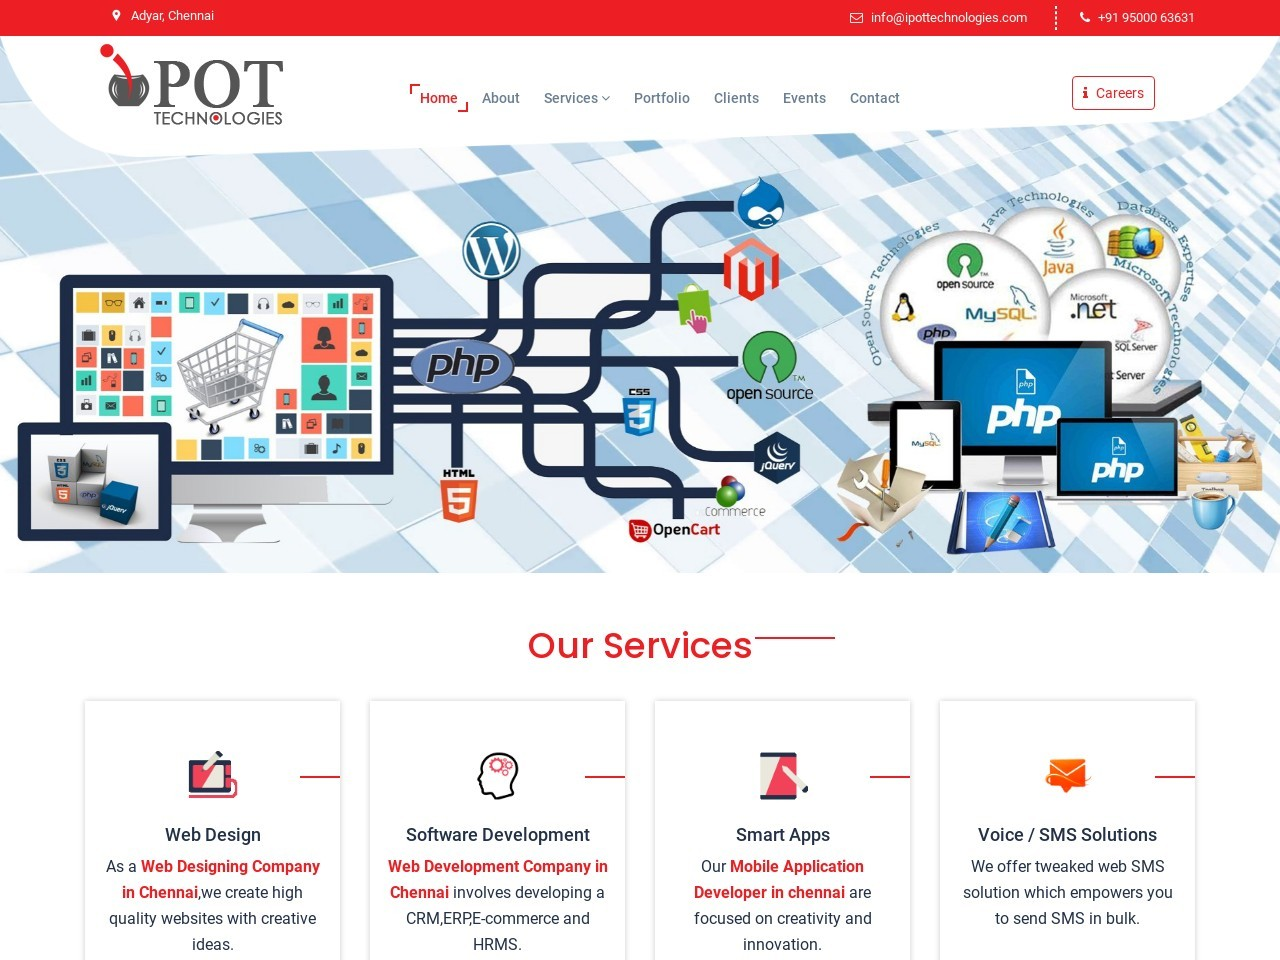 IPOT Technologies-Great SEO Companies In Chennai | Top SEO Service In Chennai |SEO Experts In Chennai